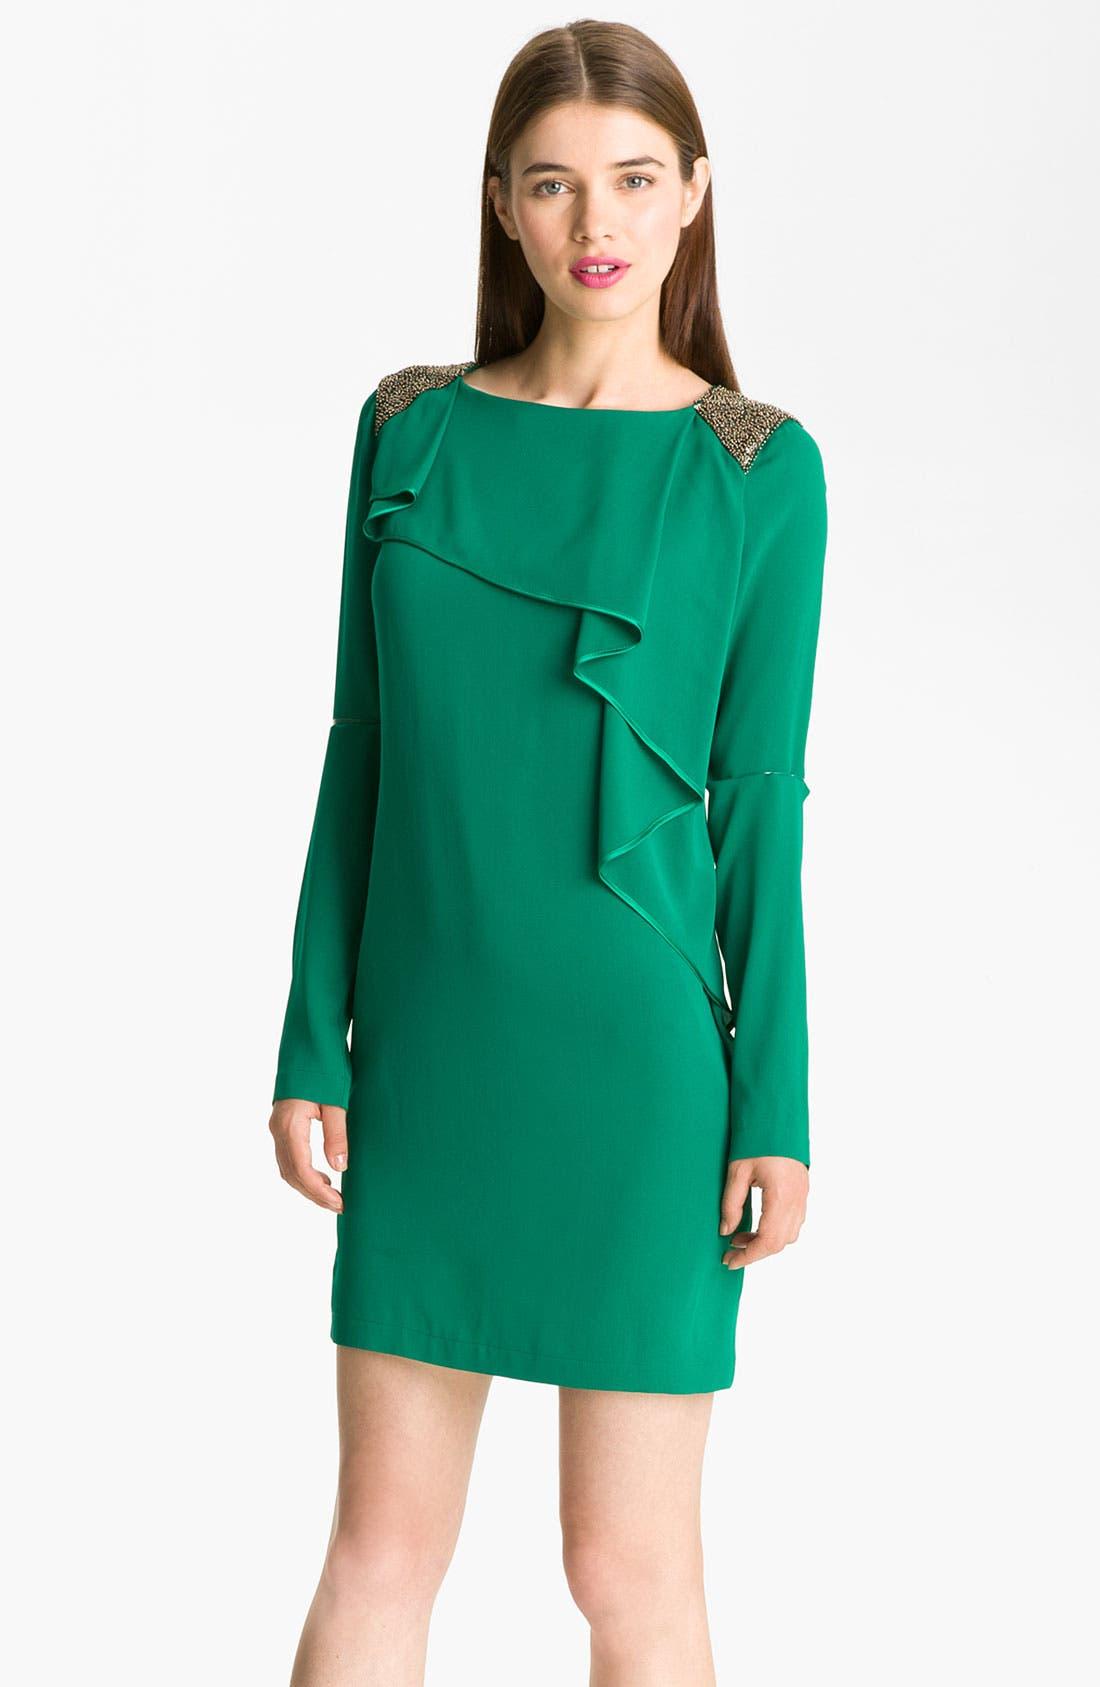 Alternate Image 1 Selected - Robert Rodriguez Embellished Cascade Ruffle Dress